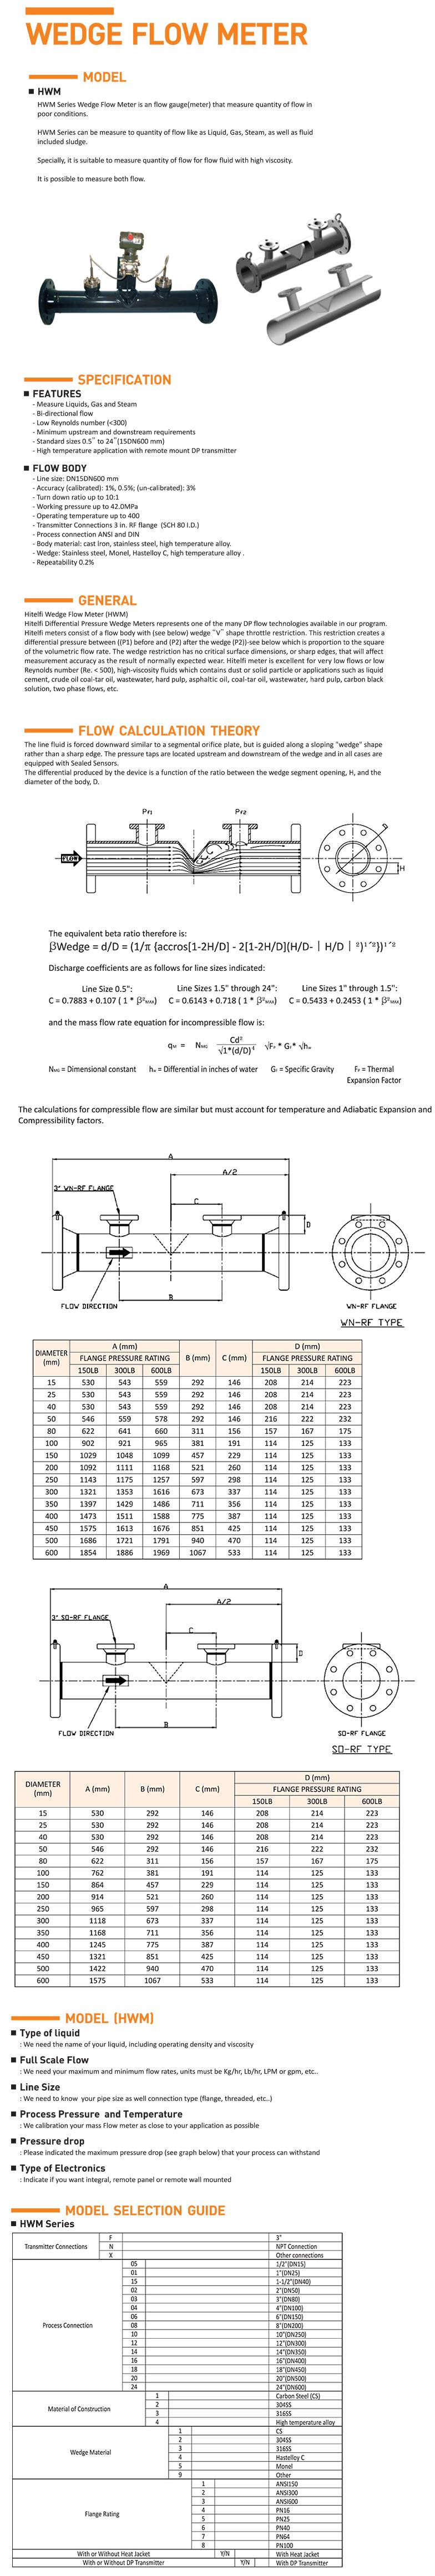 HITELFI Wedge Flow Meter HWM